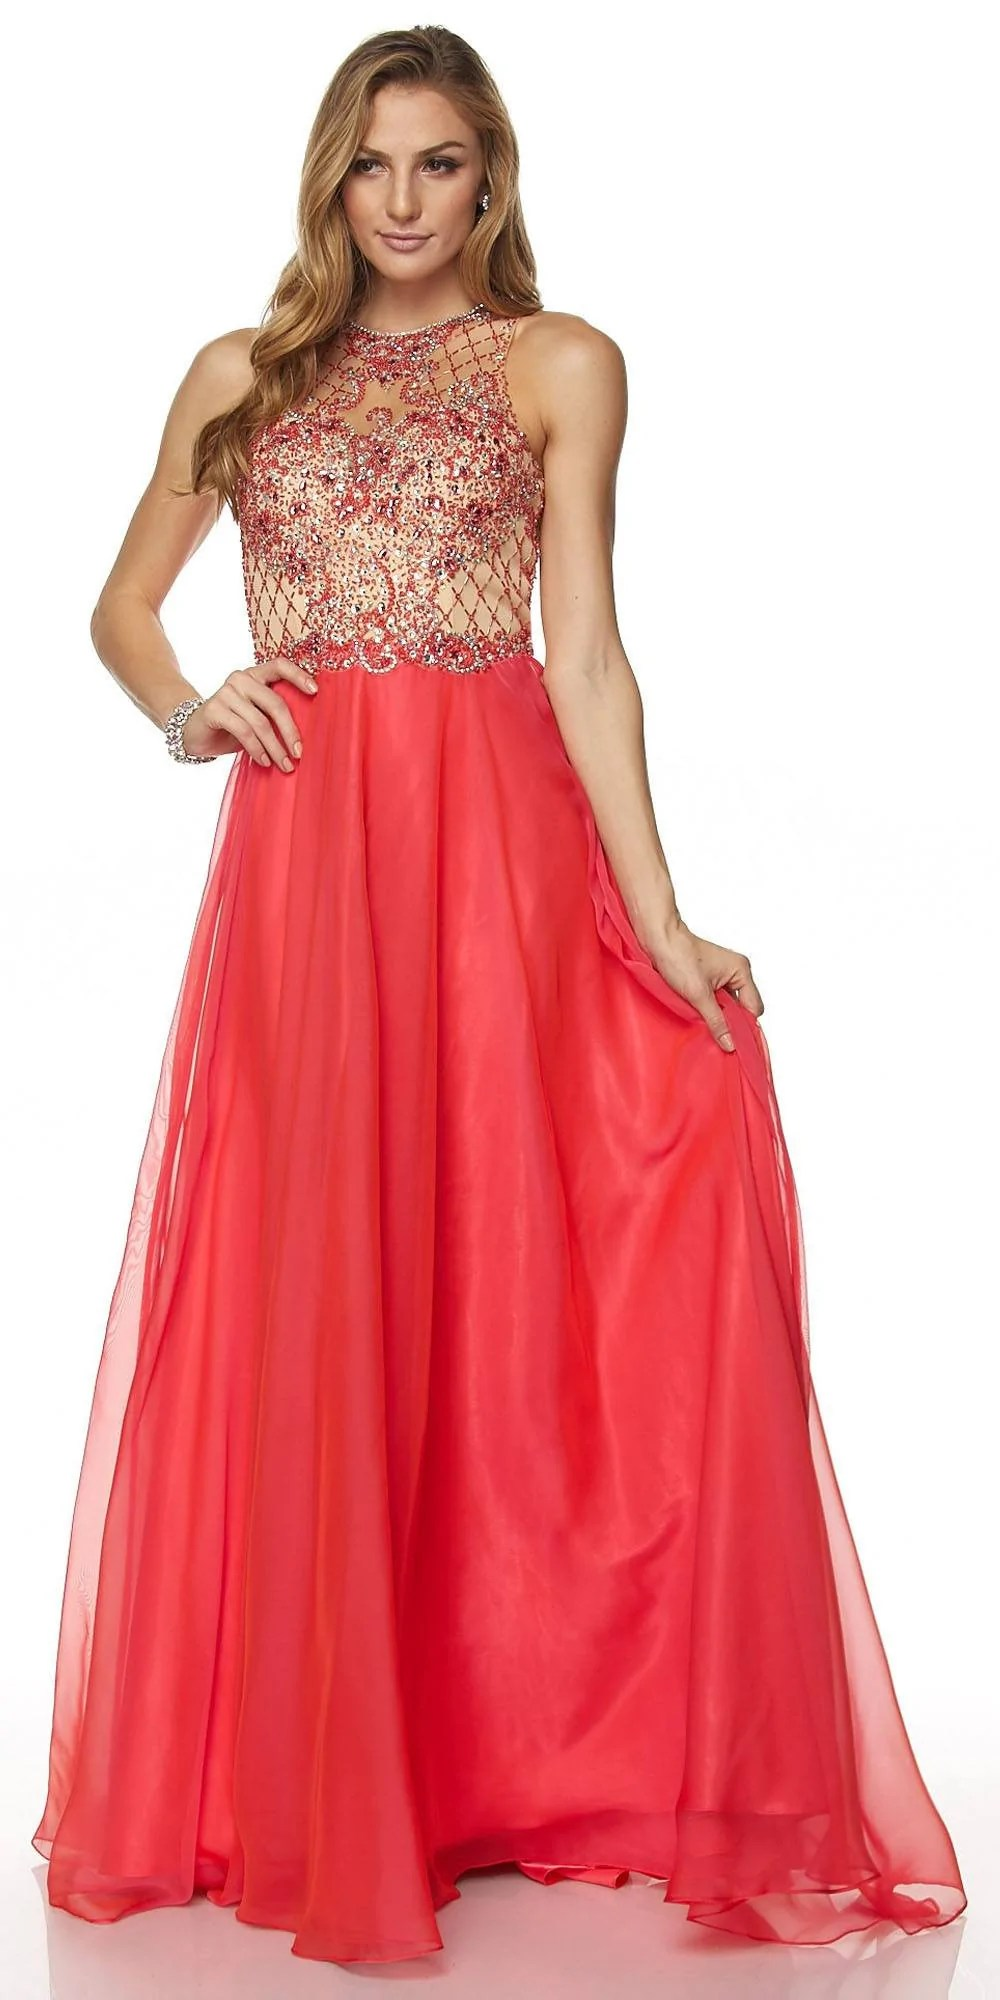 Juliet 637 Sleeveless -line Rhinestone Embellished Prom